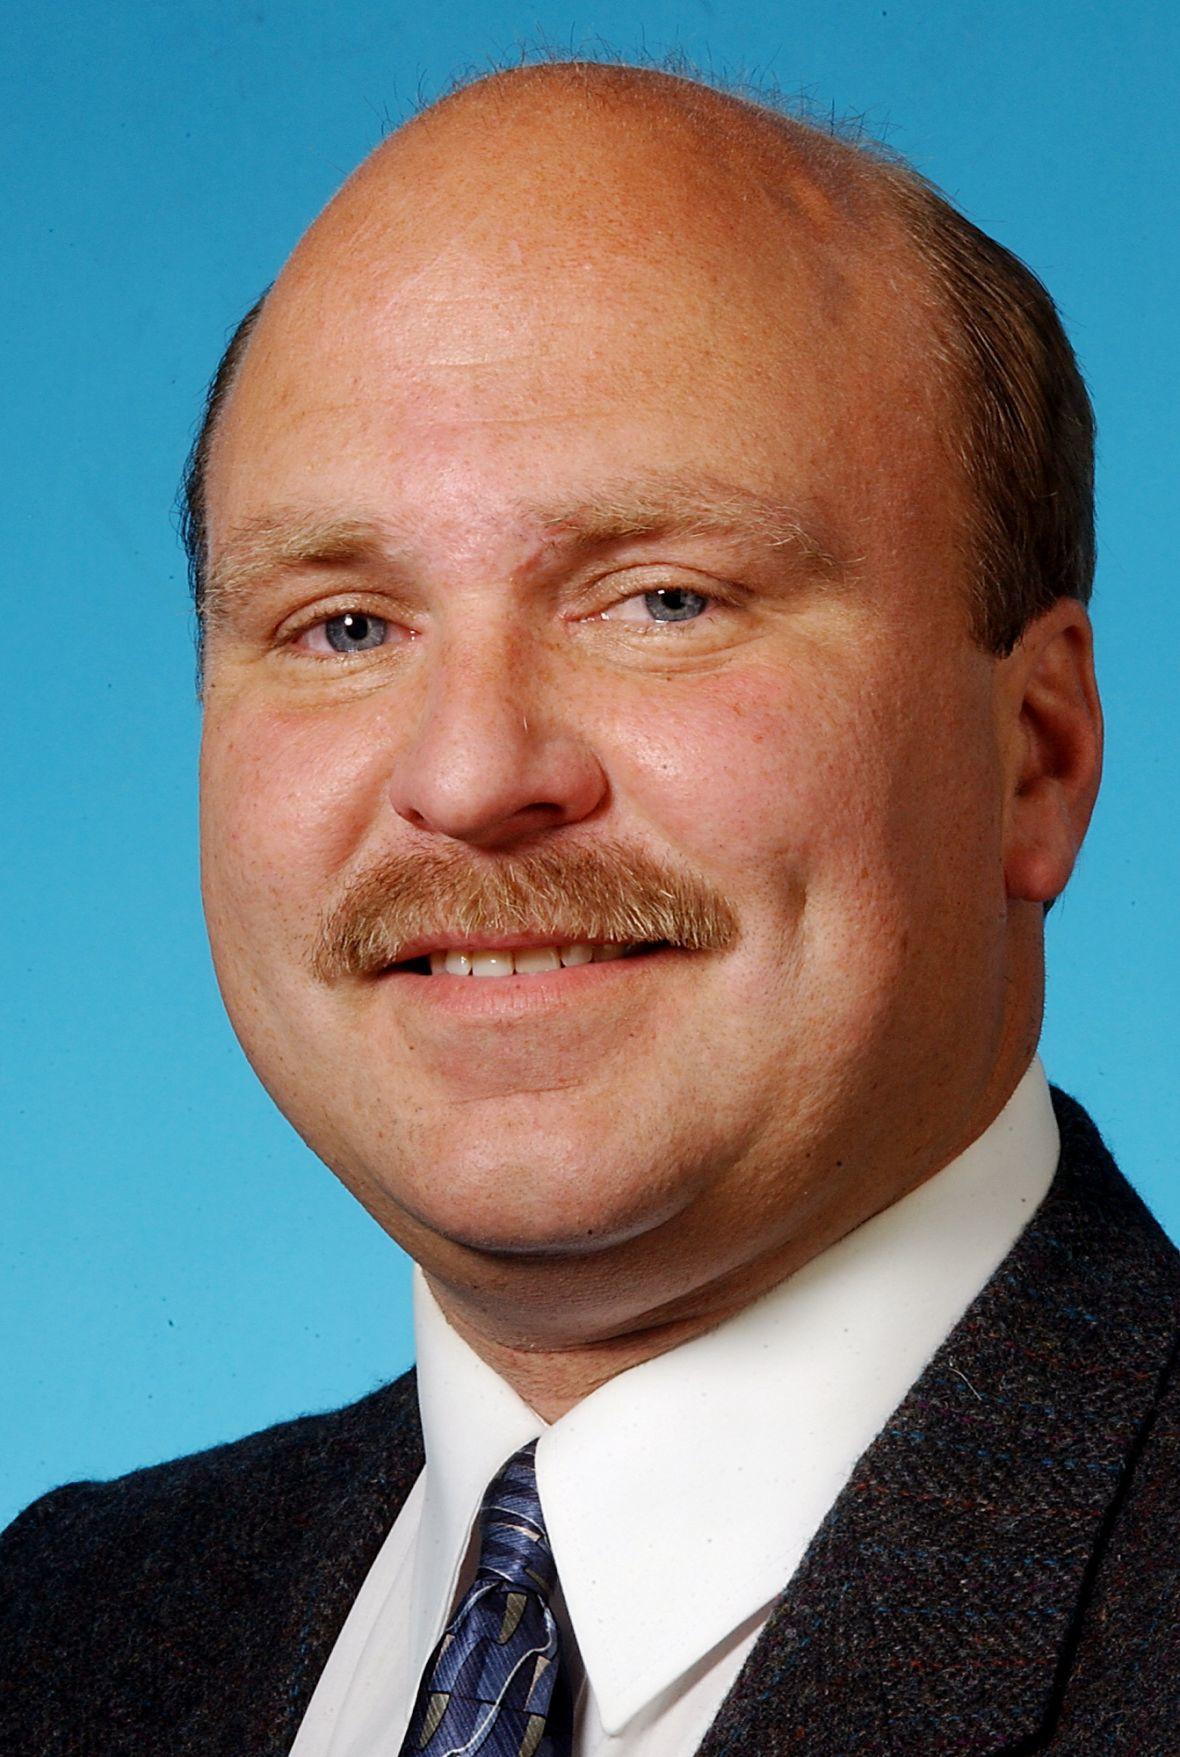 Kevin Wanggaard